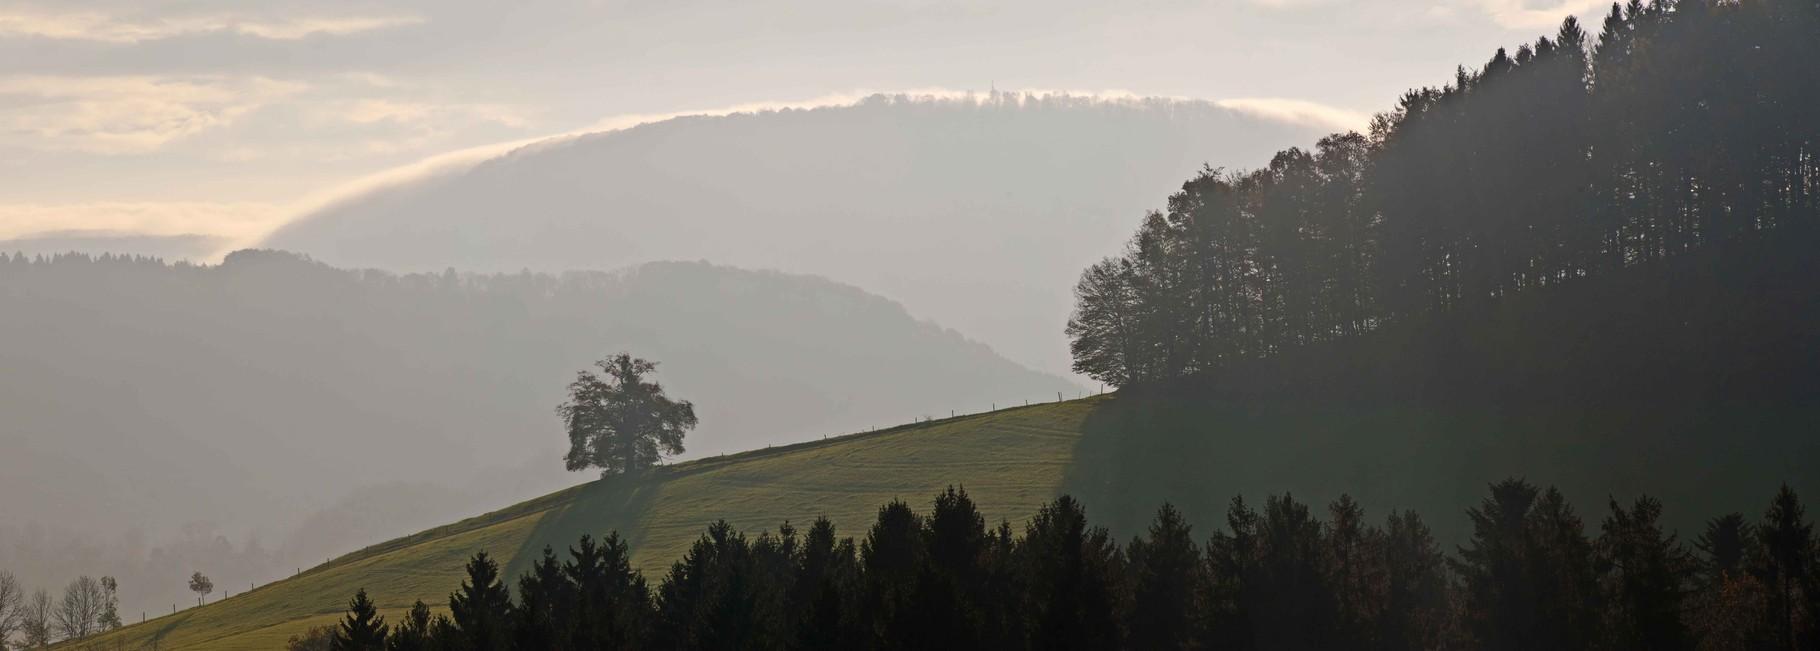 bei Reichenbach am Rechberg